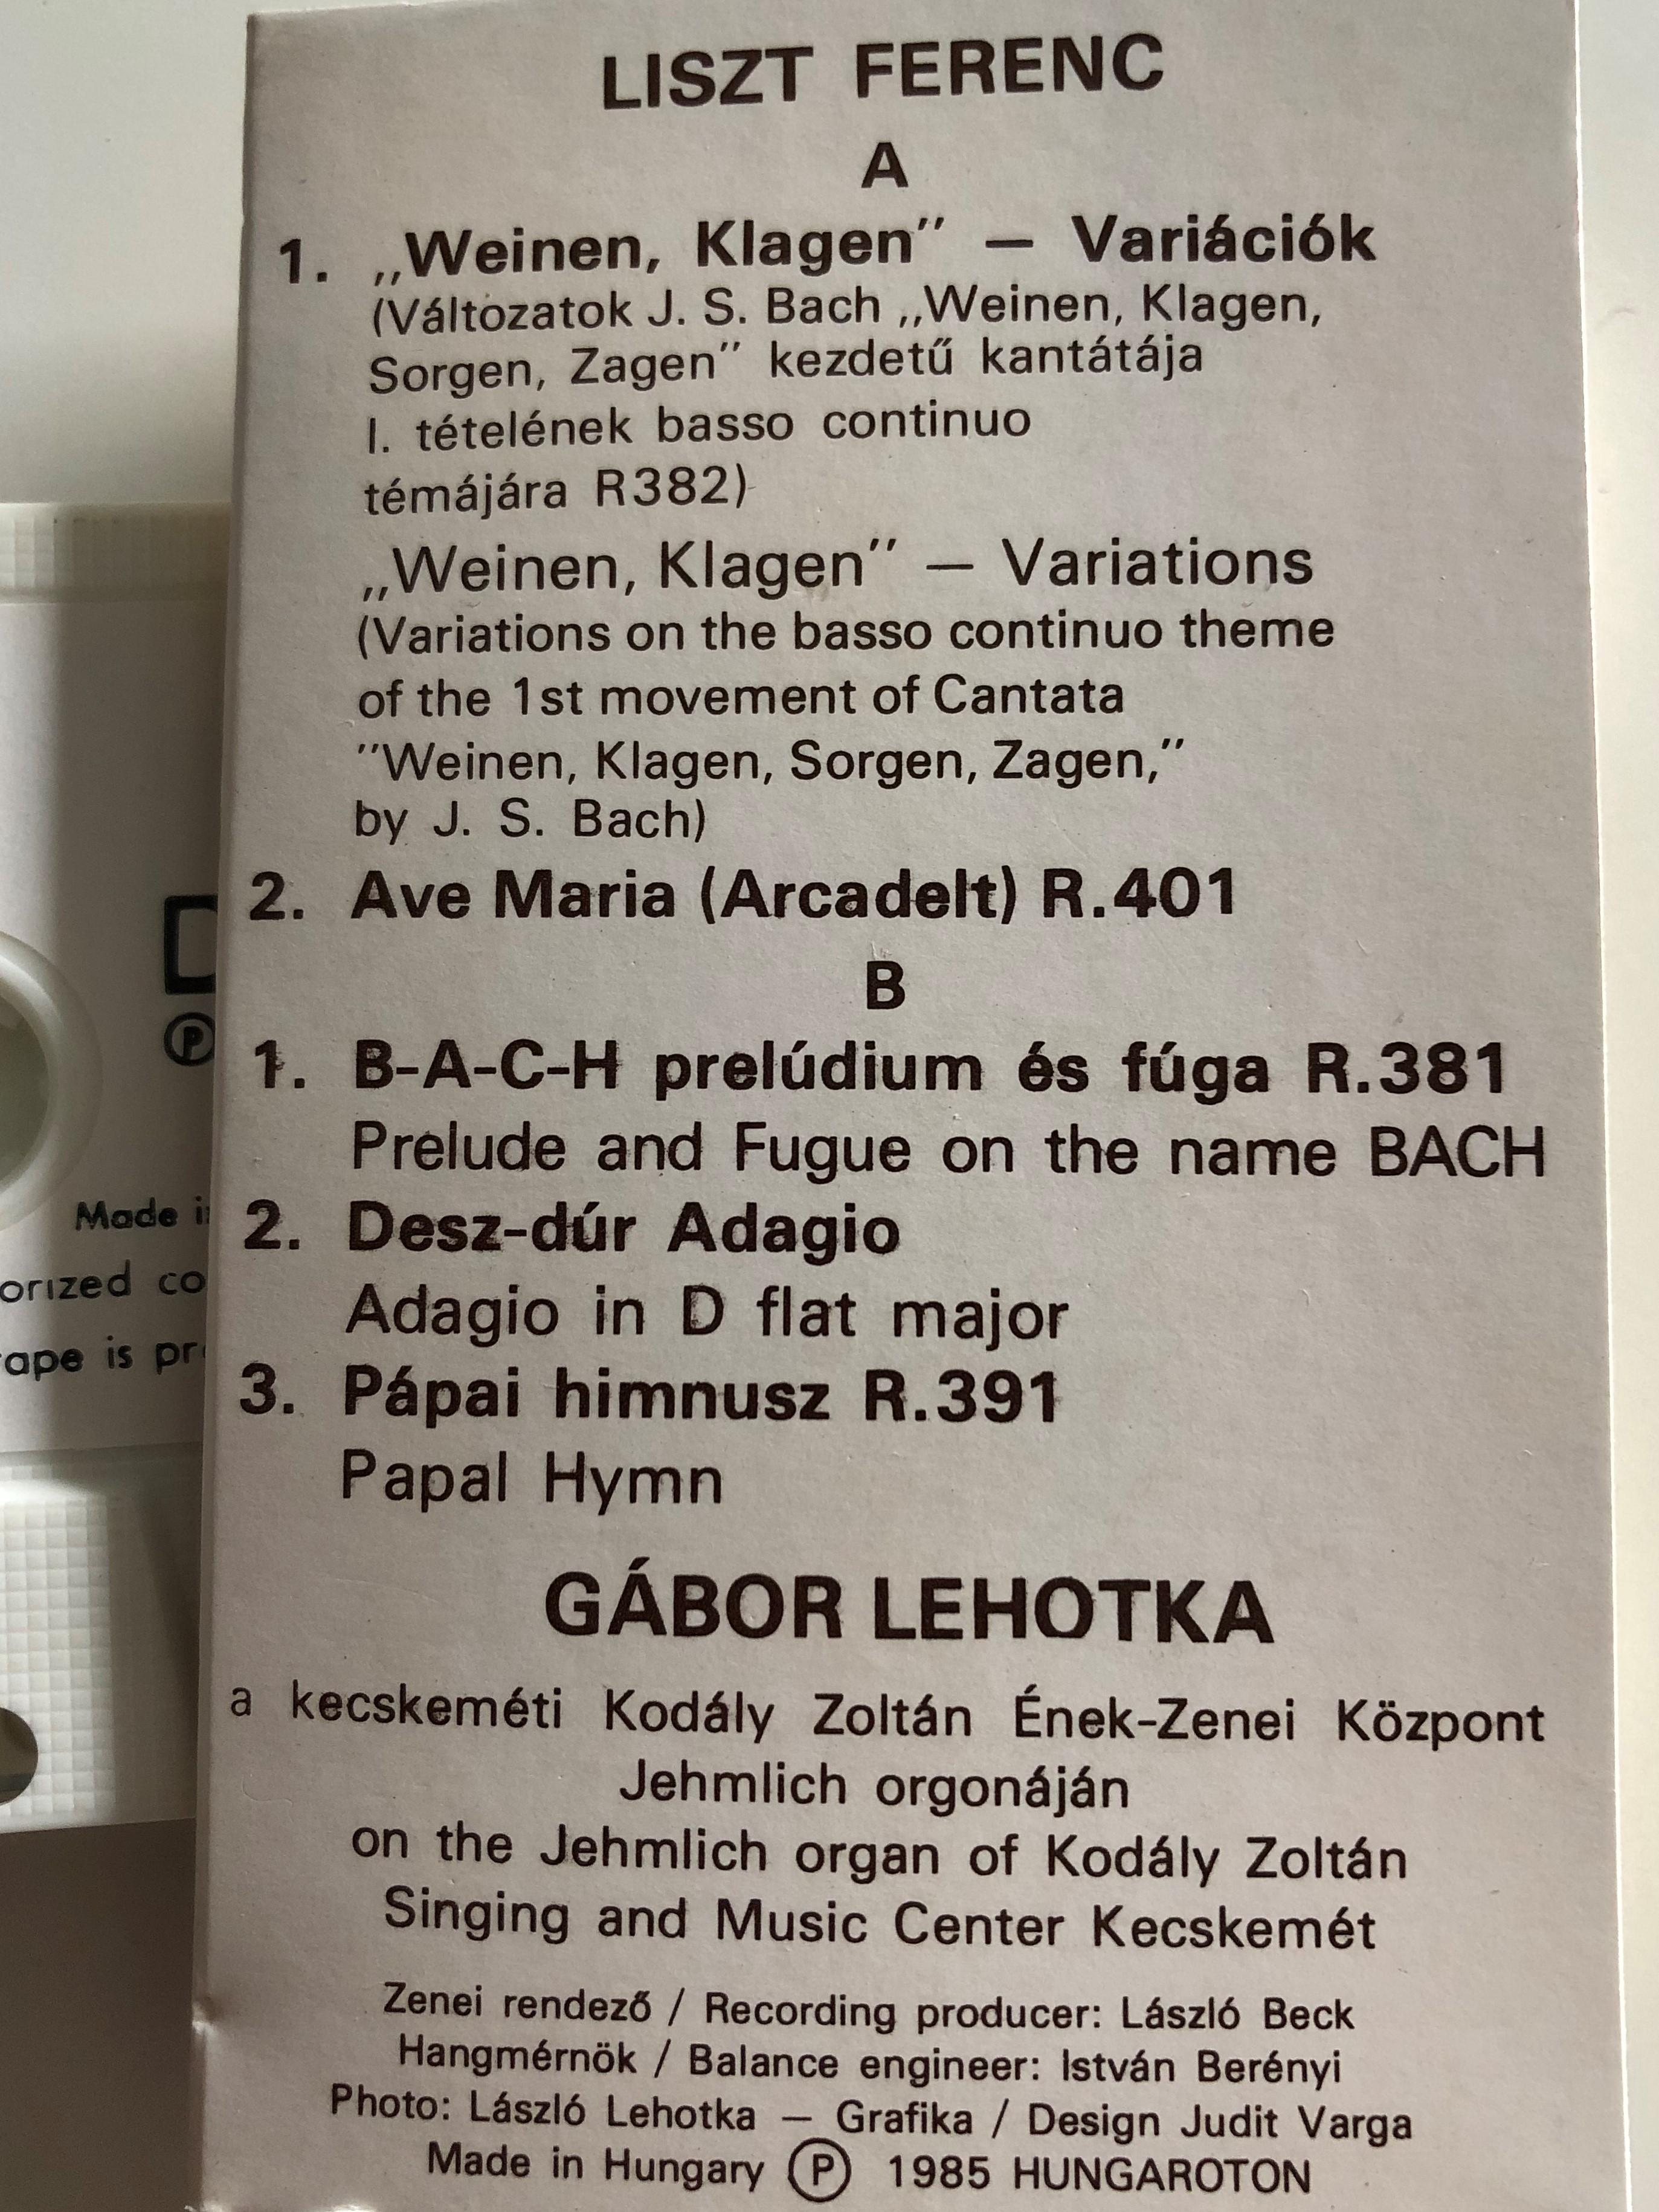 liszt-weinen-klagen-sorgen-zagen-variations-prelude-and-fugue-on-the-name-bach-etc.-organ-gabor-lehotka-hungaroton-cassette-stereo-mk-12562-3-.jpg